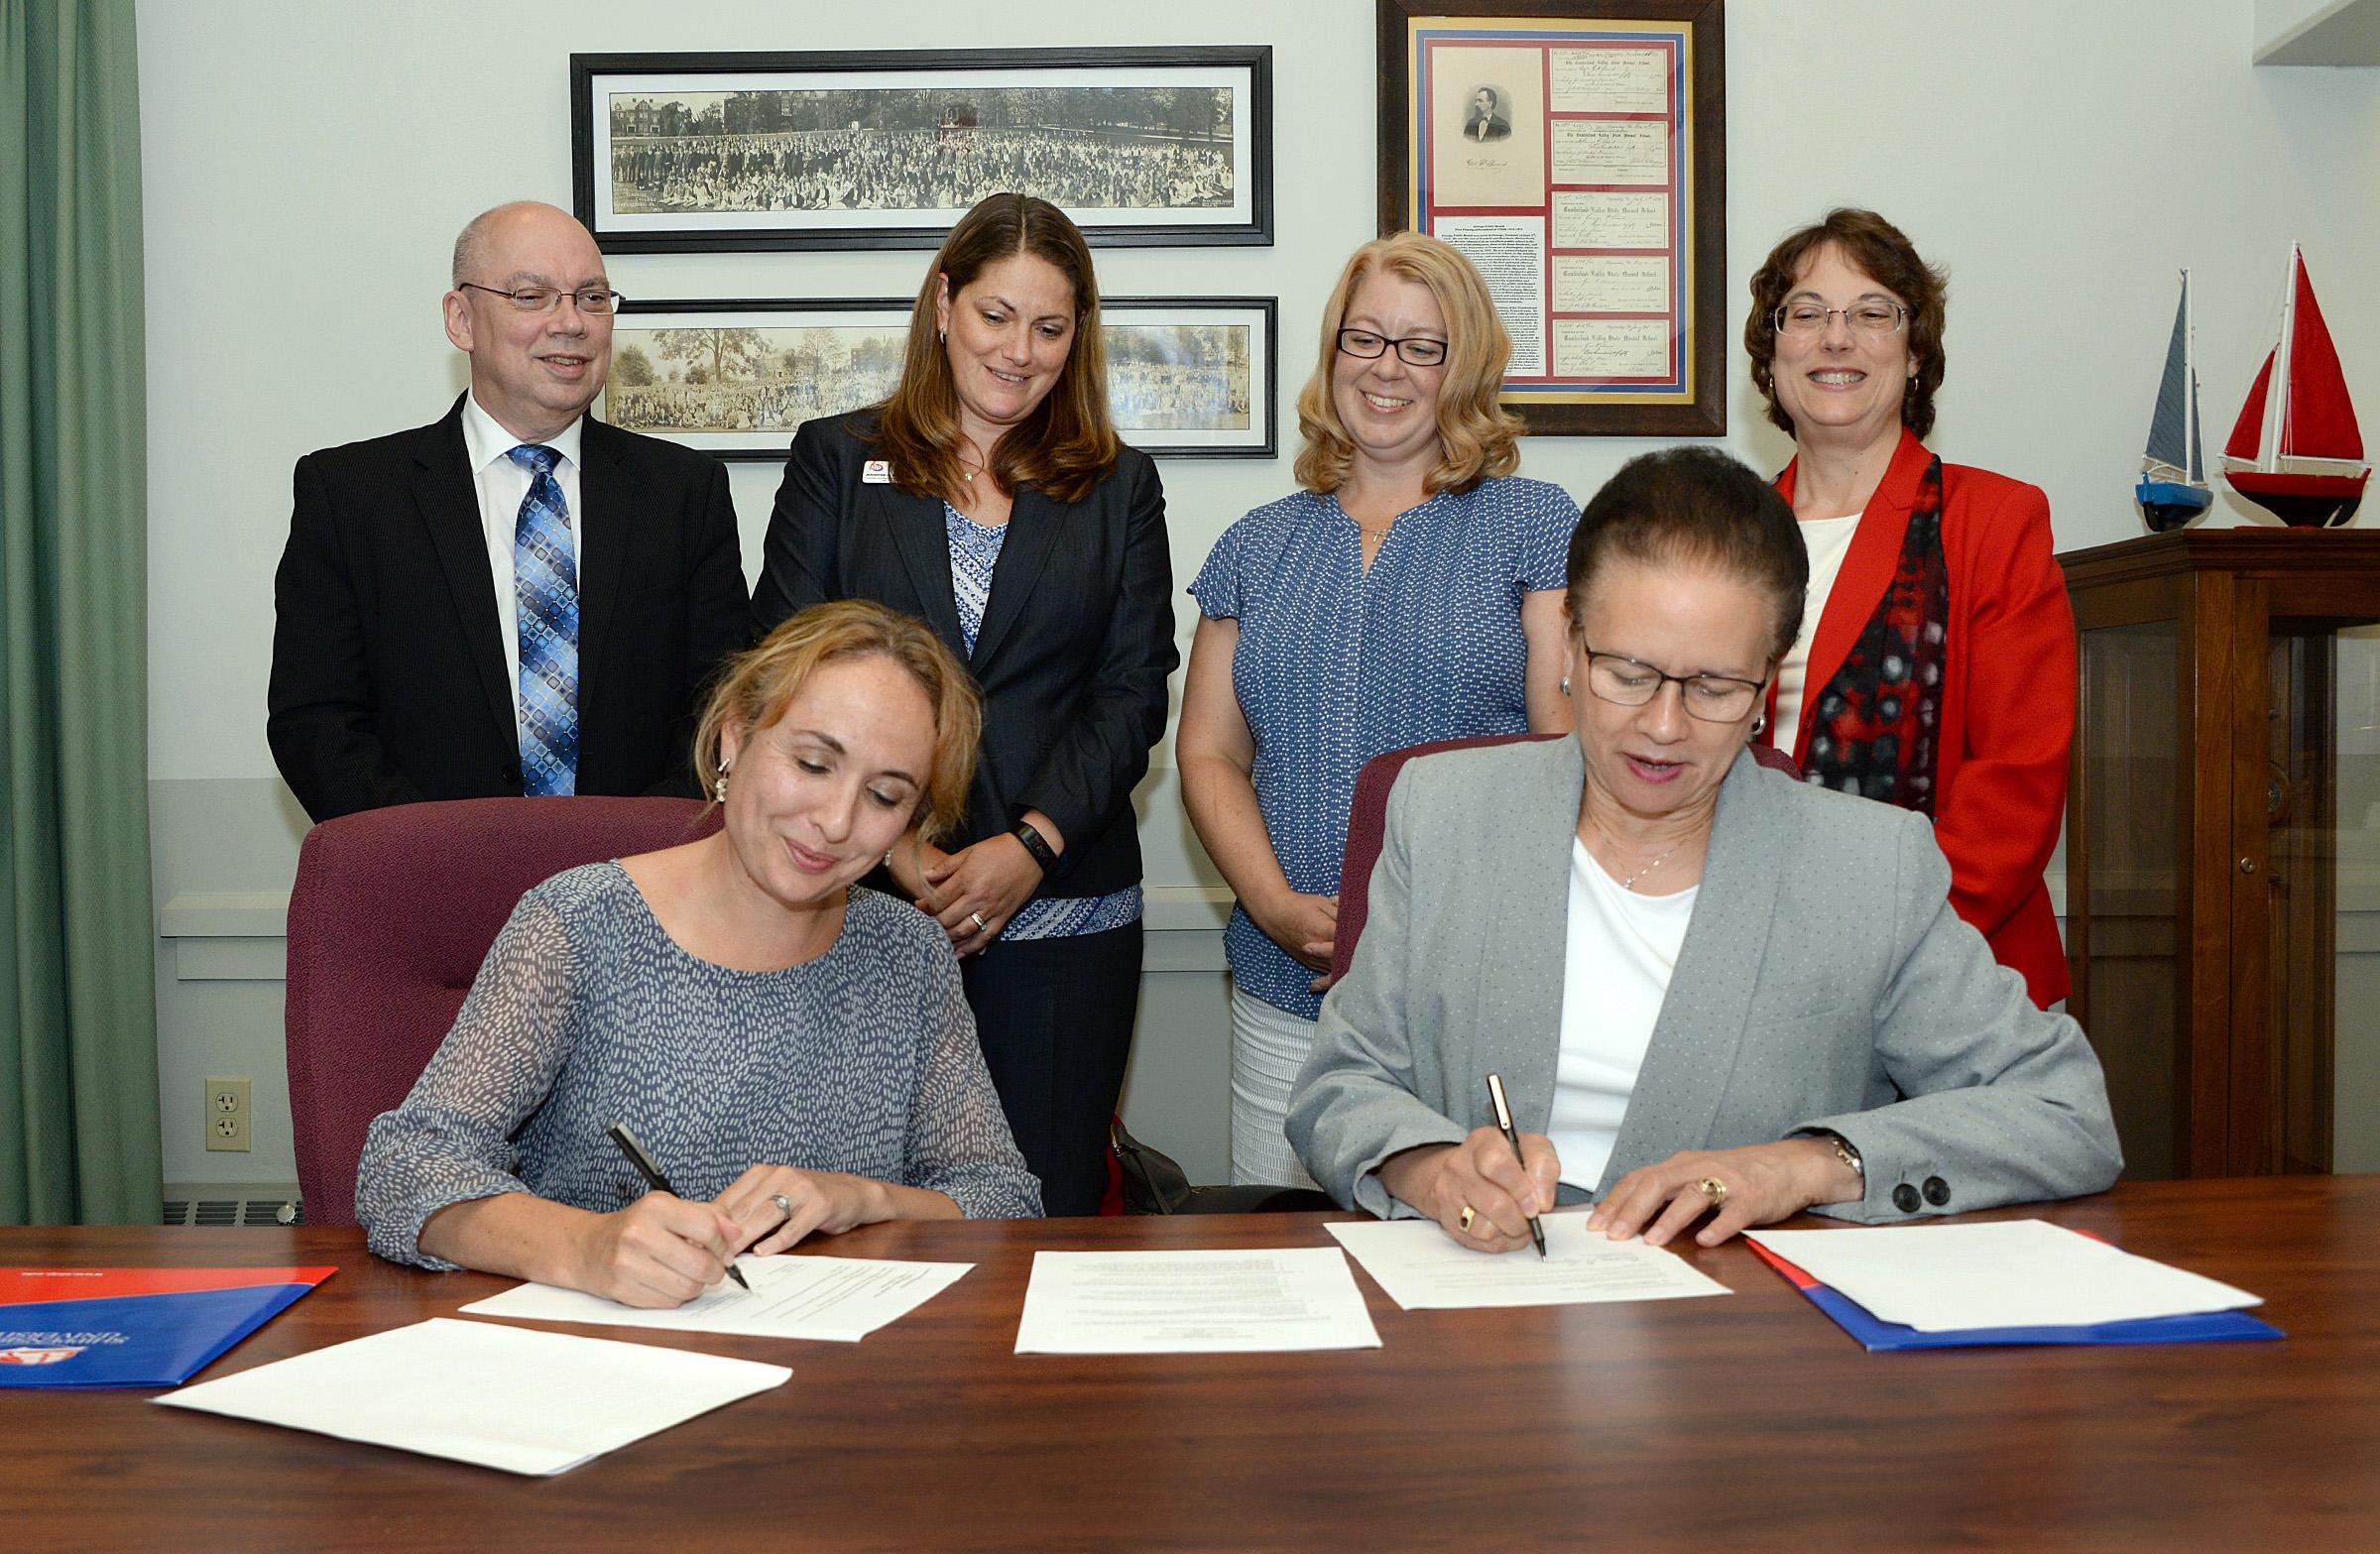 On Friday, July 28, Milton Hershey School signed a memorandum of understanding (MOU) with Shippensburg University.